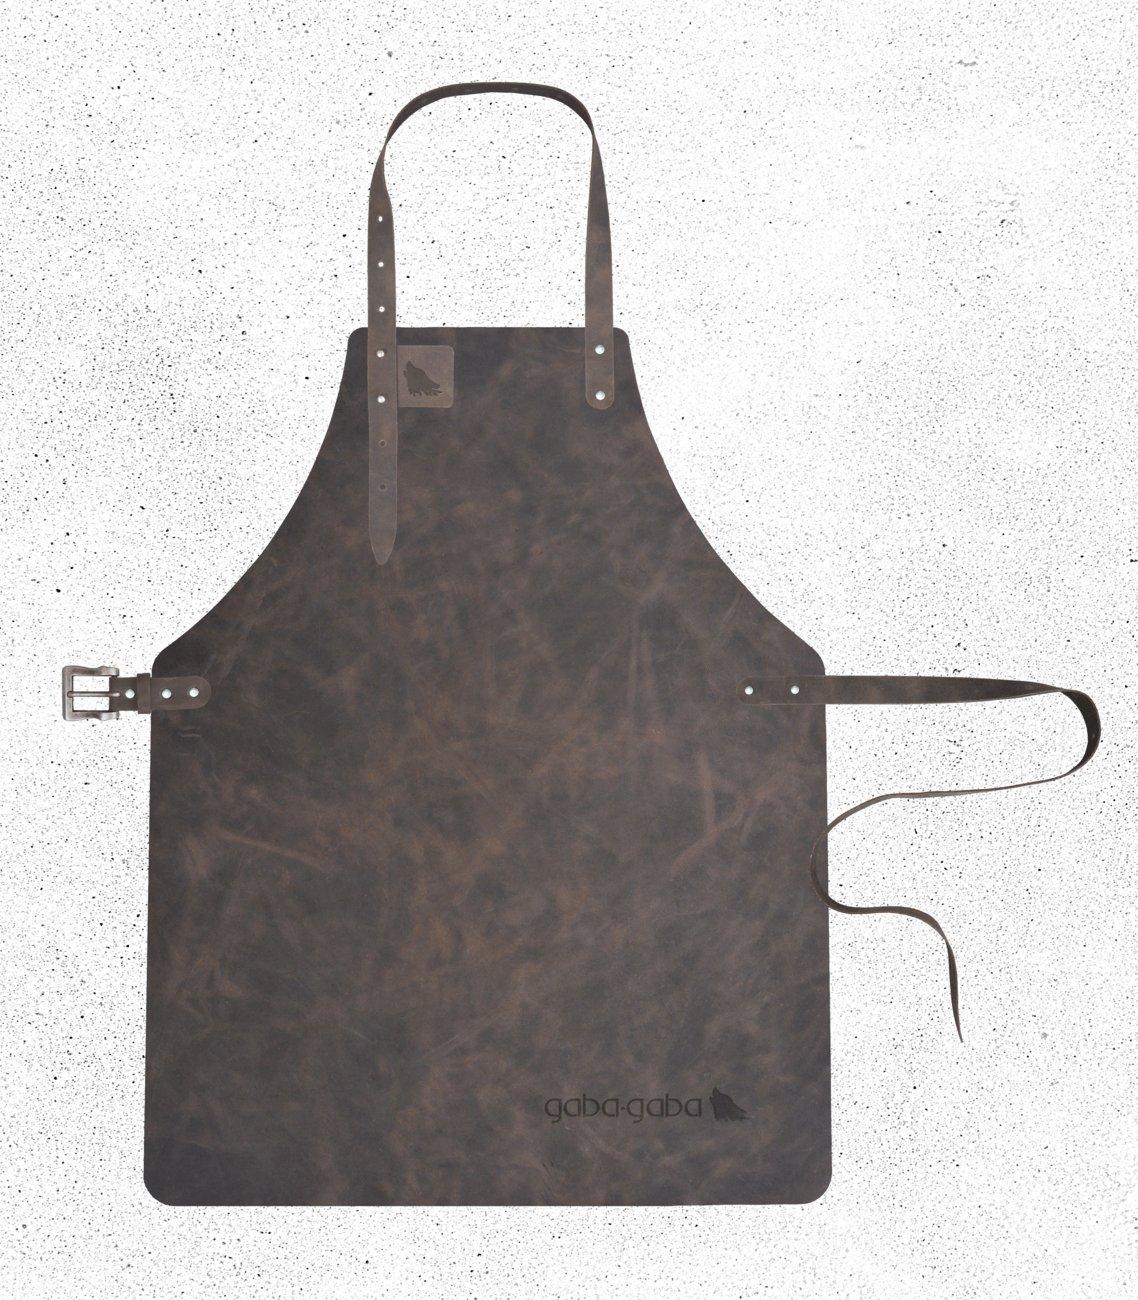 Gaba Gaba - Grillschürze / Lederschürze / Kellnerschürze aus Leder (geeignet für Barista, Gastronomie & Grillen) - Hippo - Hippo (Schokoladenbraun) - S - 58 x 72cm